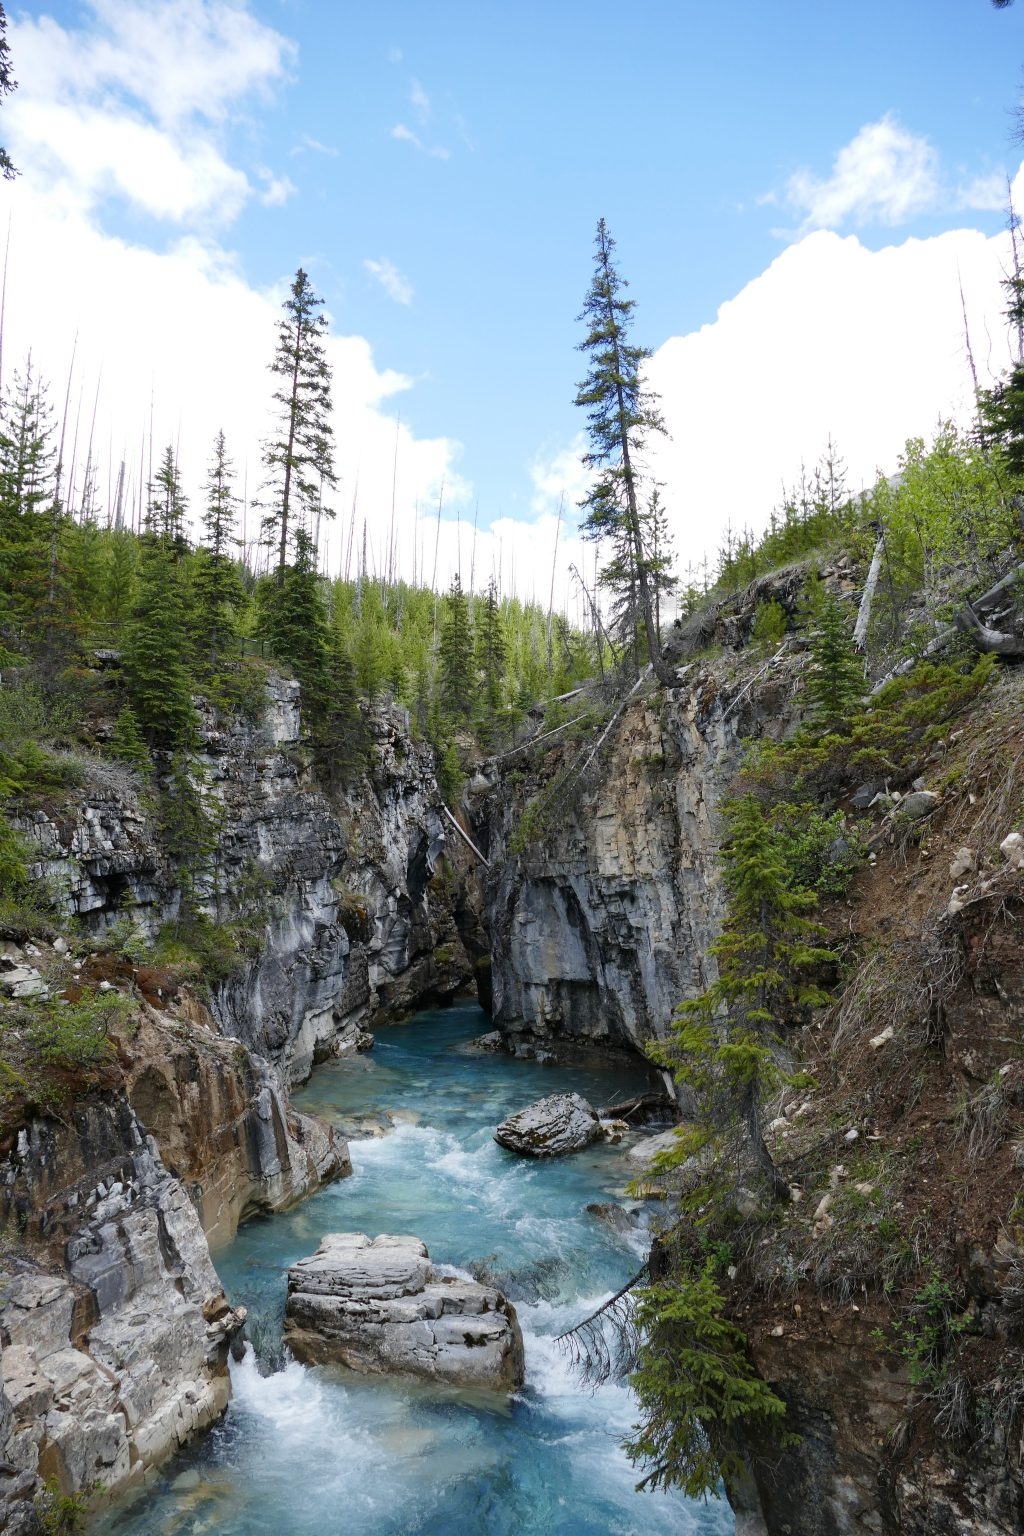 Kootenay National Park: Marble Canyon